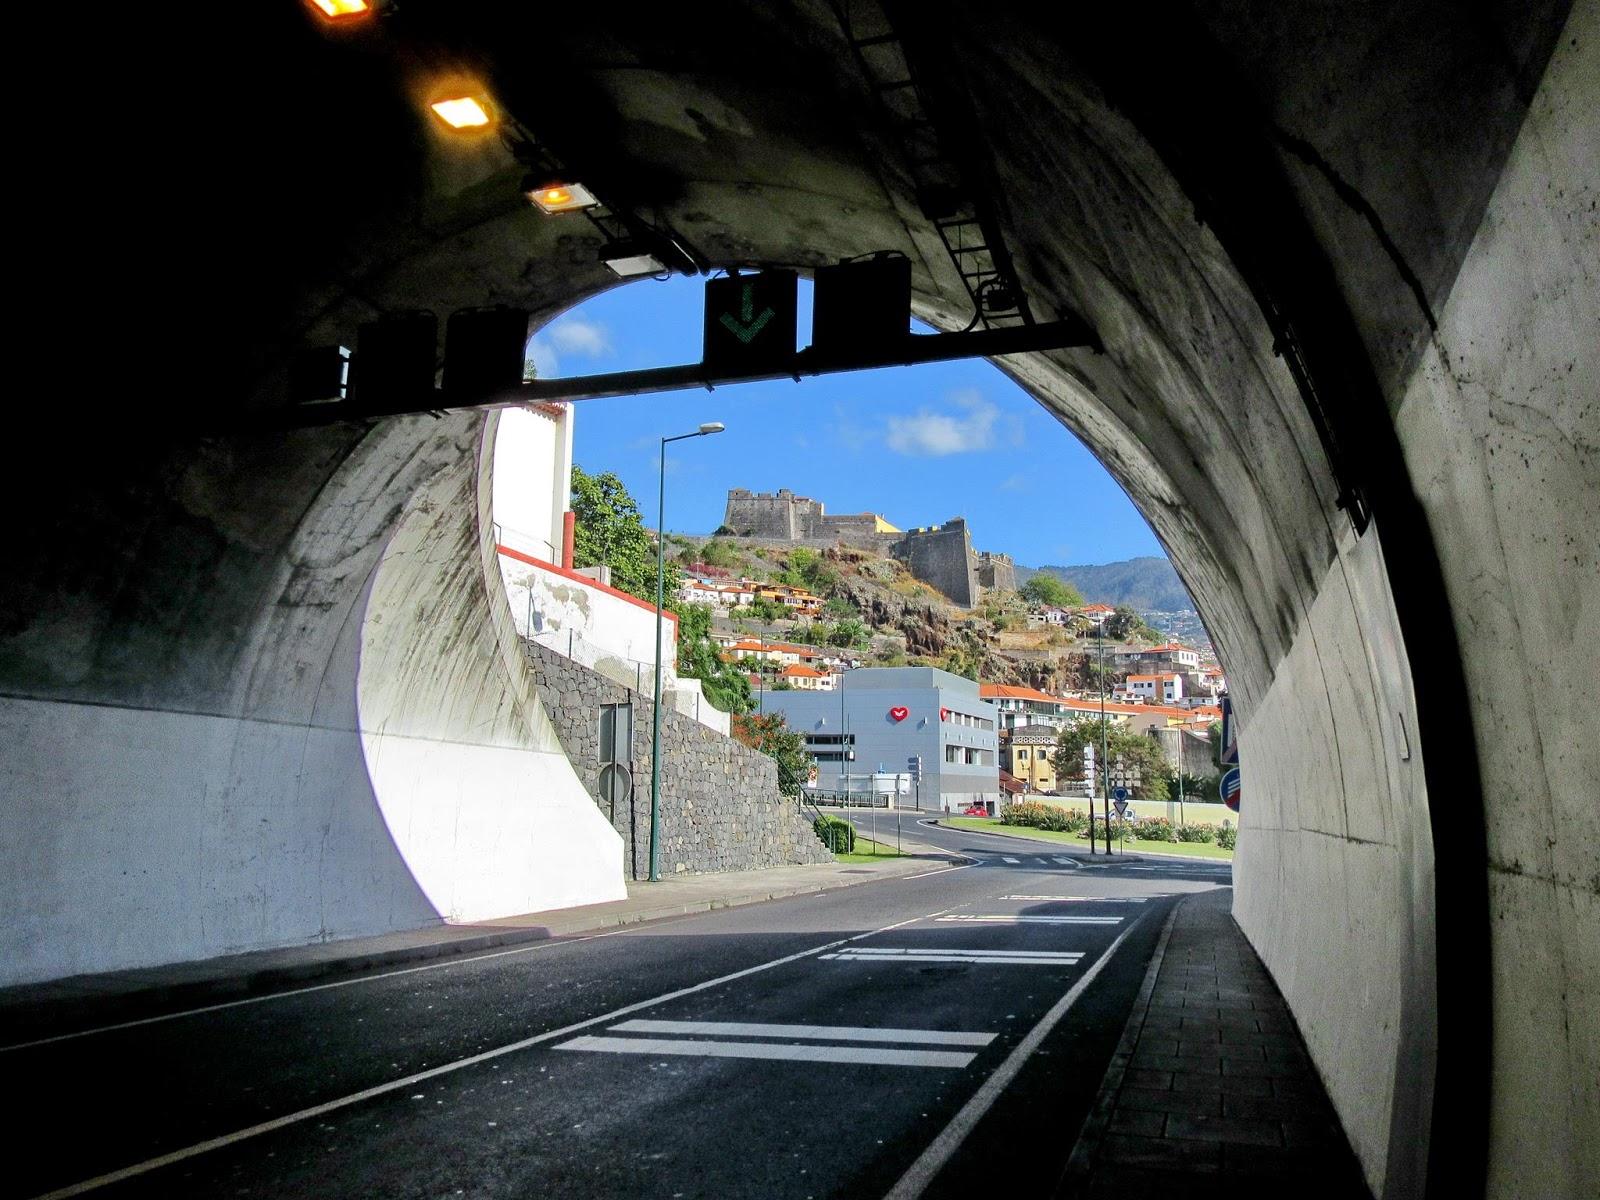 há fortaleza ao fundo do túnel